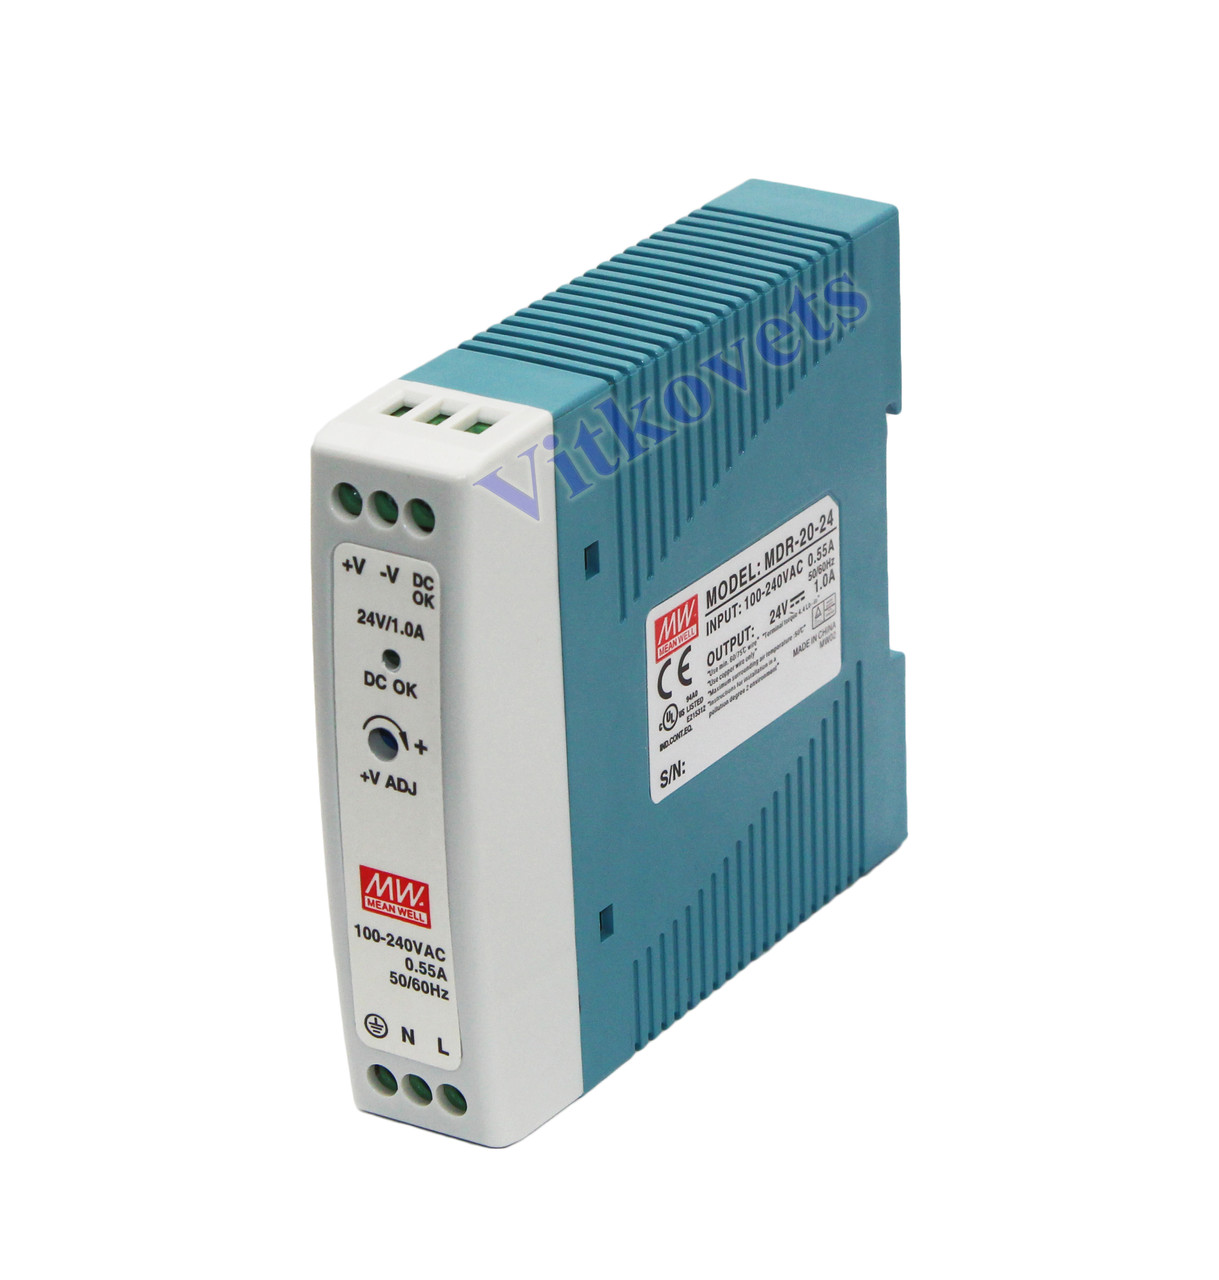 Источник питания MDR-20-24 (24V 1.0А 24W) для ЧПУ